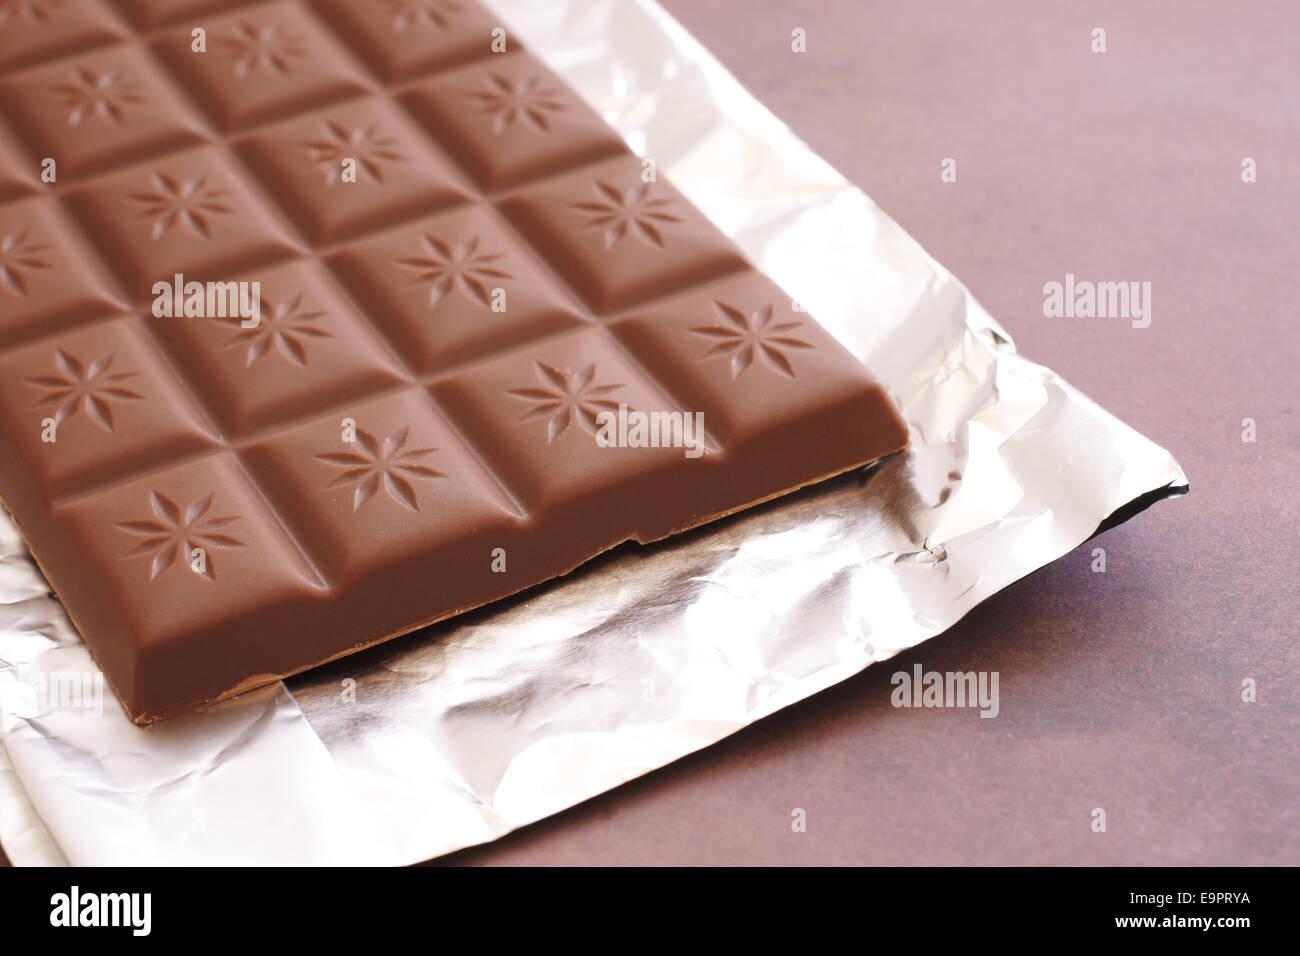 Bar Of Chocolate Wrapper Imágenes De Stock & Bar Of Chocolate ...